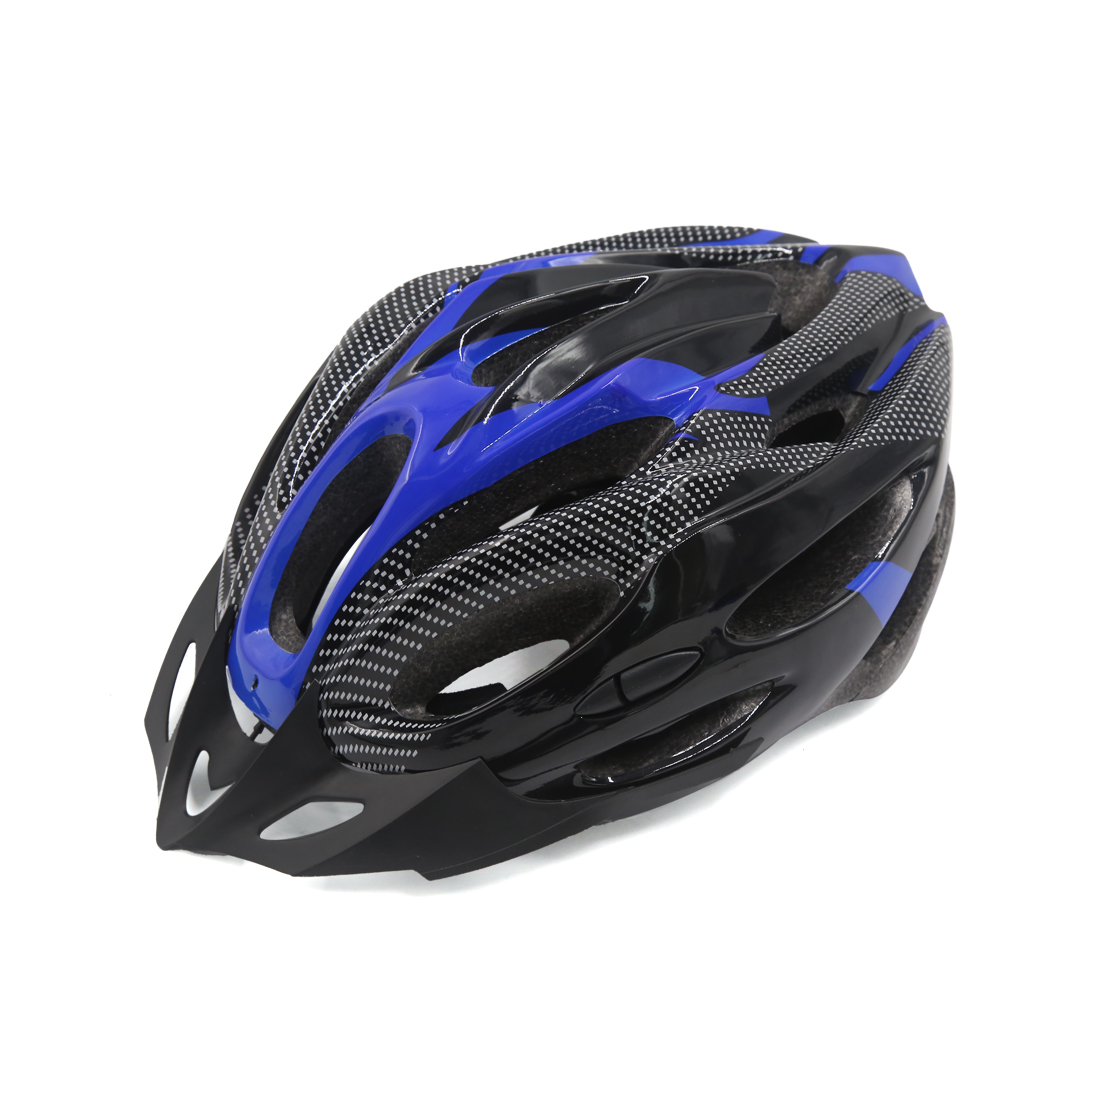 Carbon Fiber Pattern 21 Holes Cycling Bicycle Soprt Bike Helmet Visor Blue